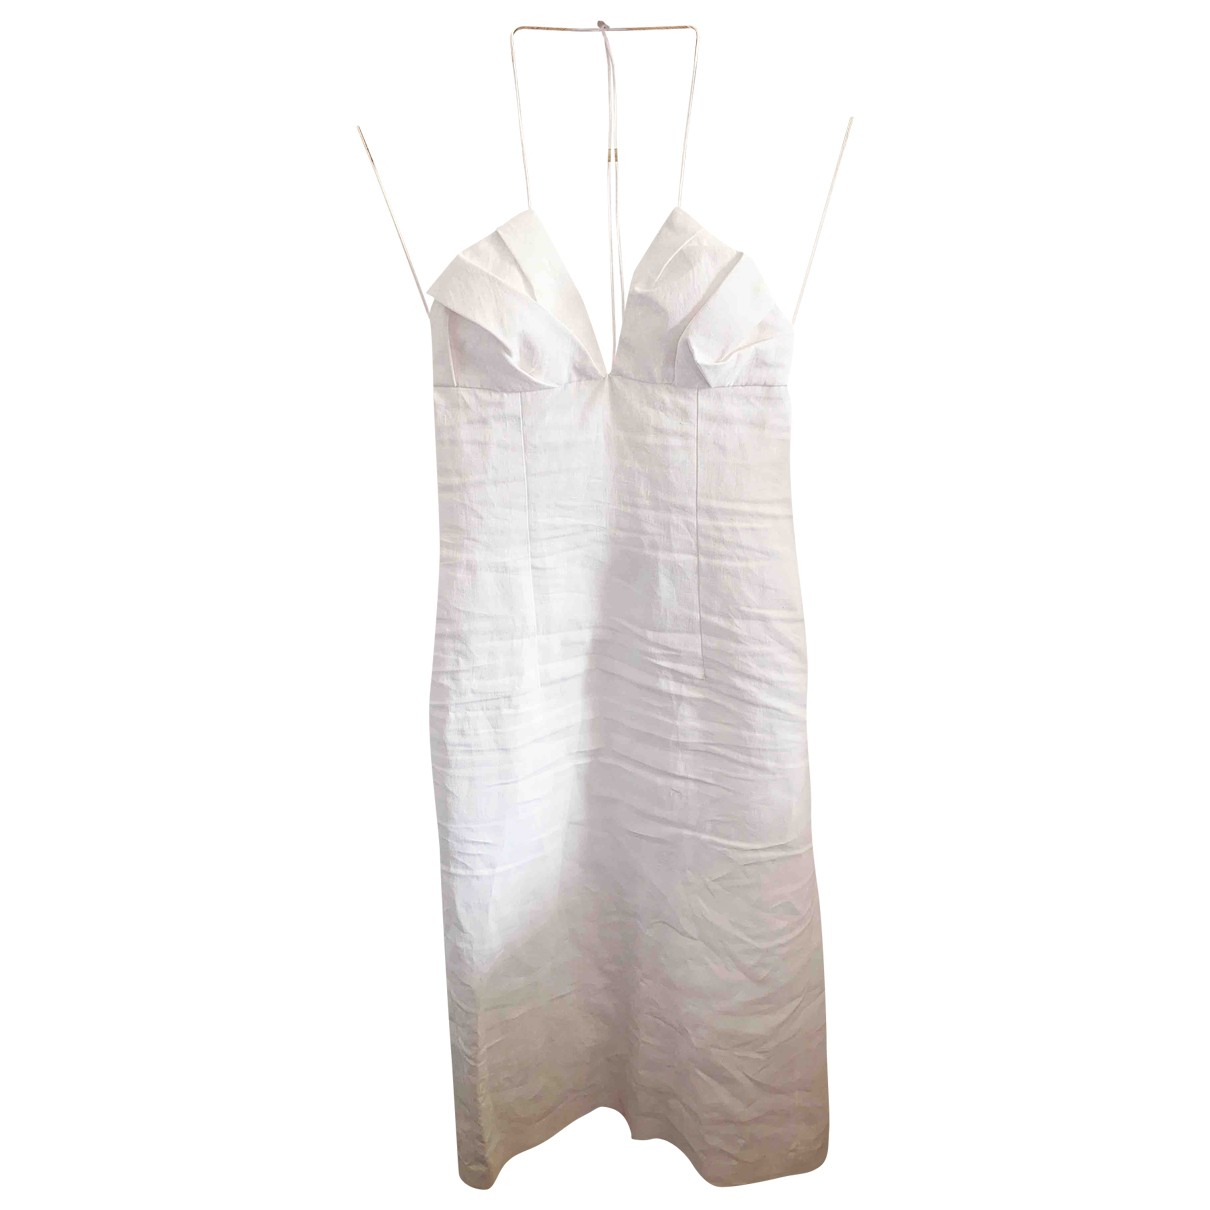 Jacquemus La Riviera White Cotton dress for Women 34 FR